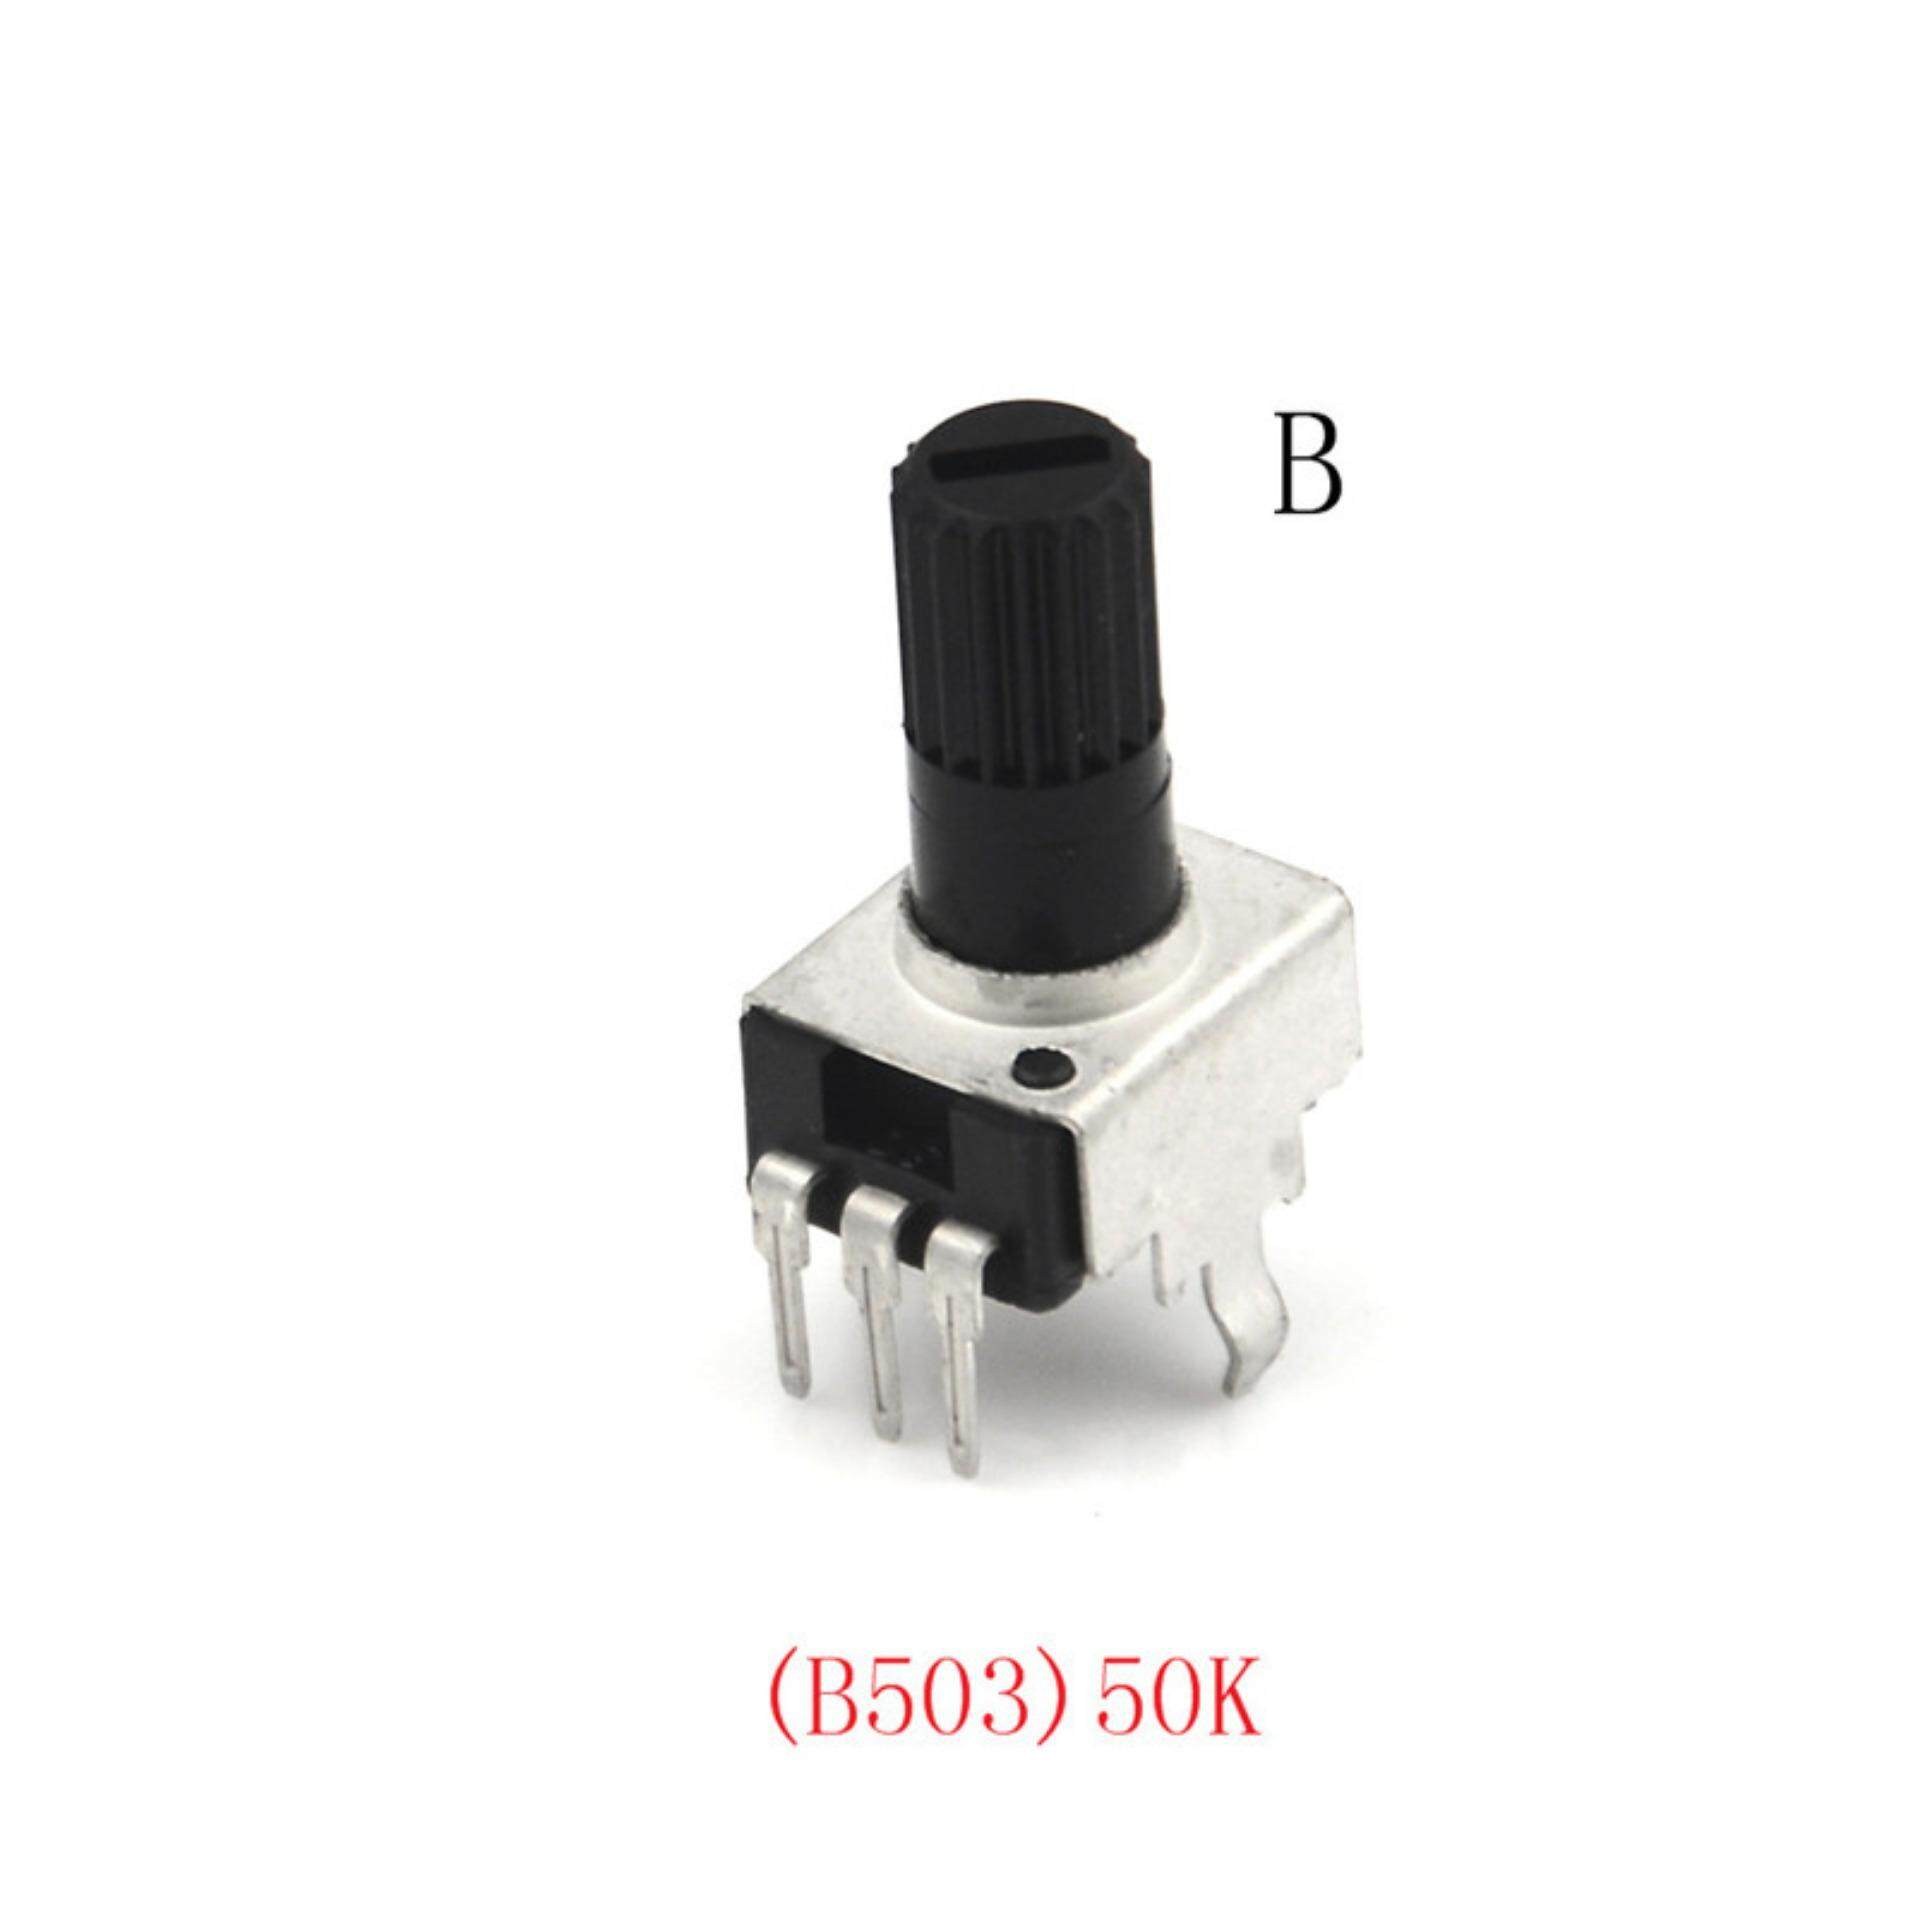 Buy Sell Cheapest Adjustable Potentiometer Module Best Quality Potensio 50k Mono 10 Pcs Rv09 5 100 K Potensiometer Resistensi 125 Mm Poros 3 Pin